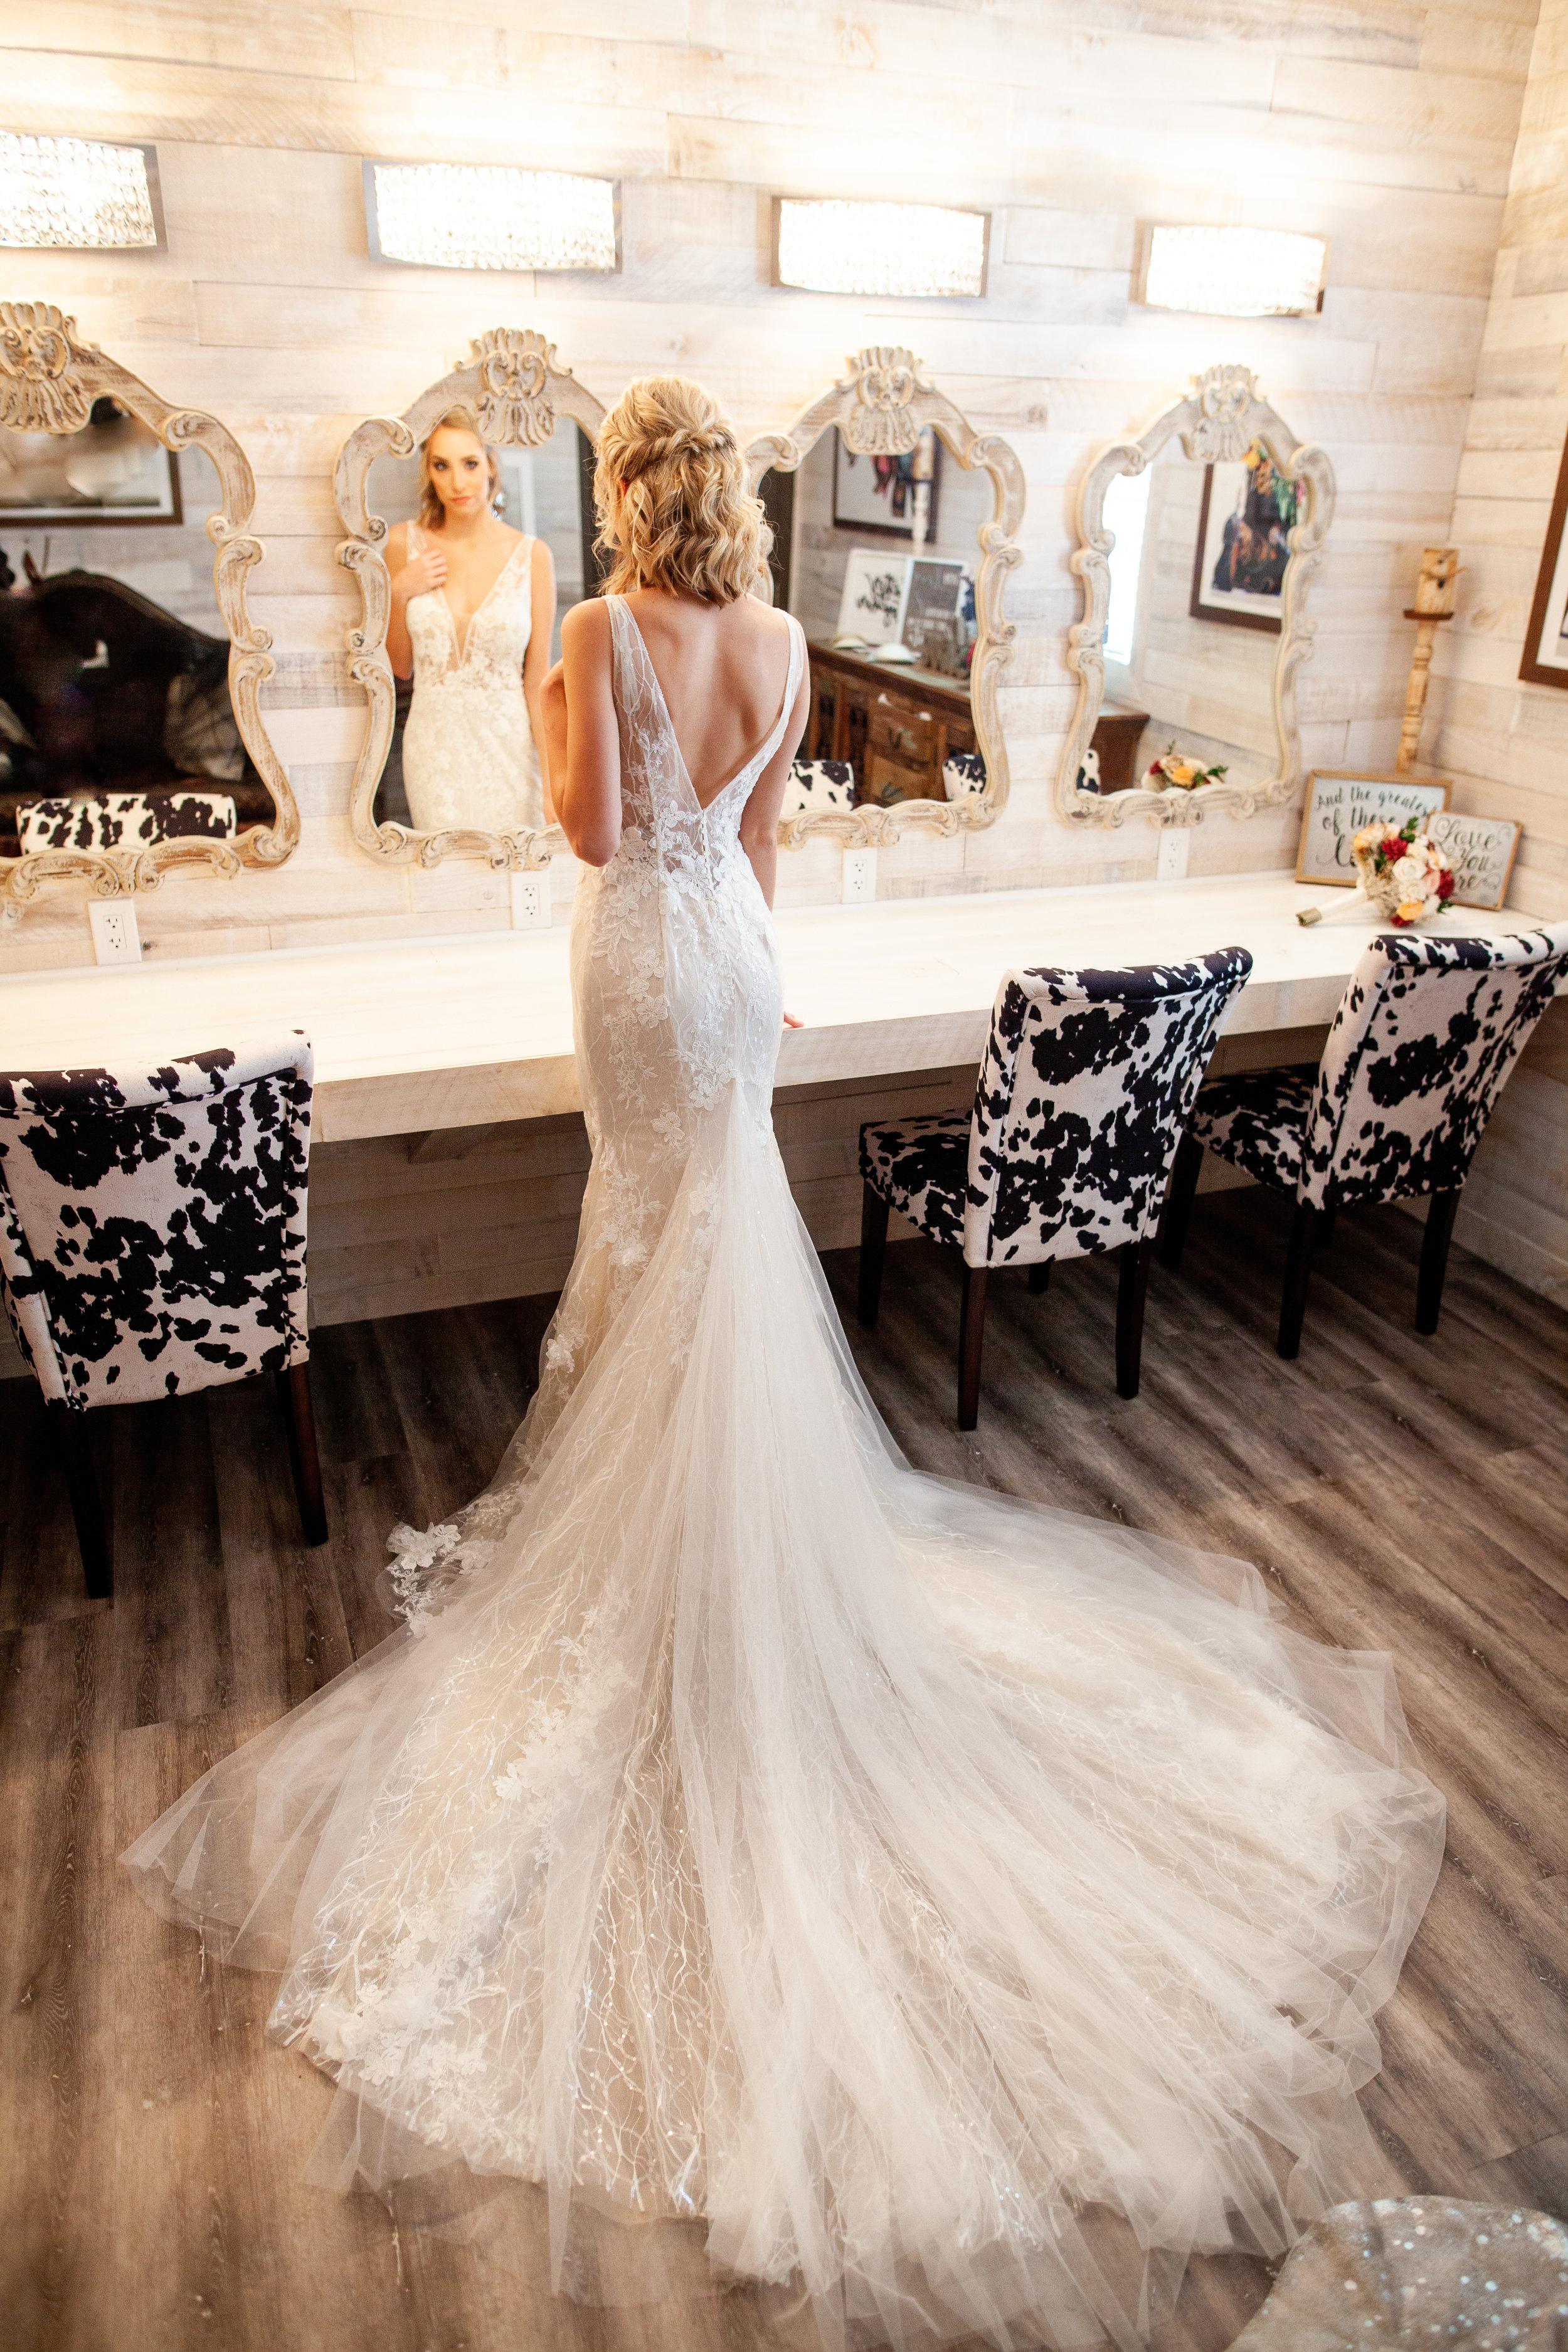 kelilina photography and films florida wedding photography videography 002-5.jpg